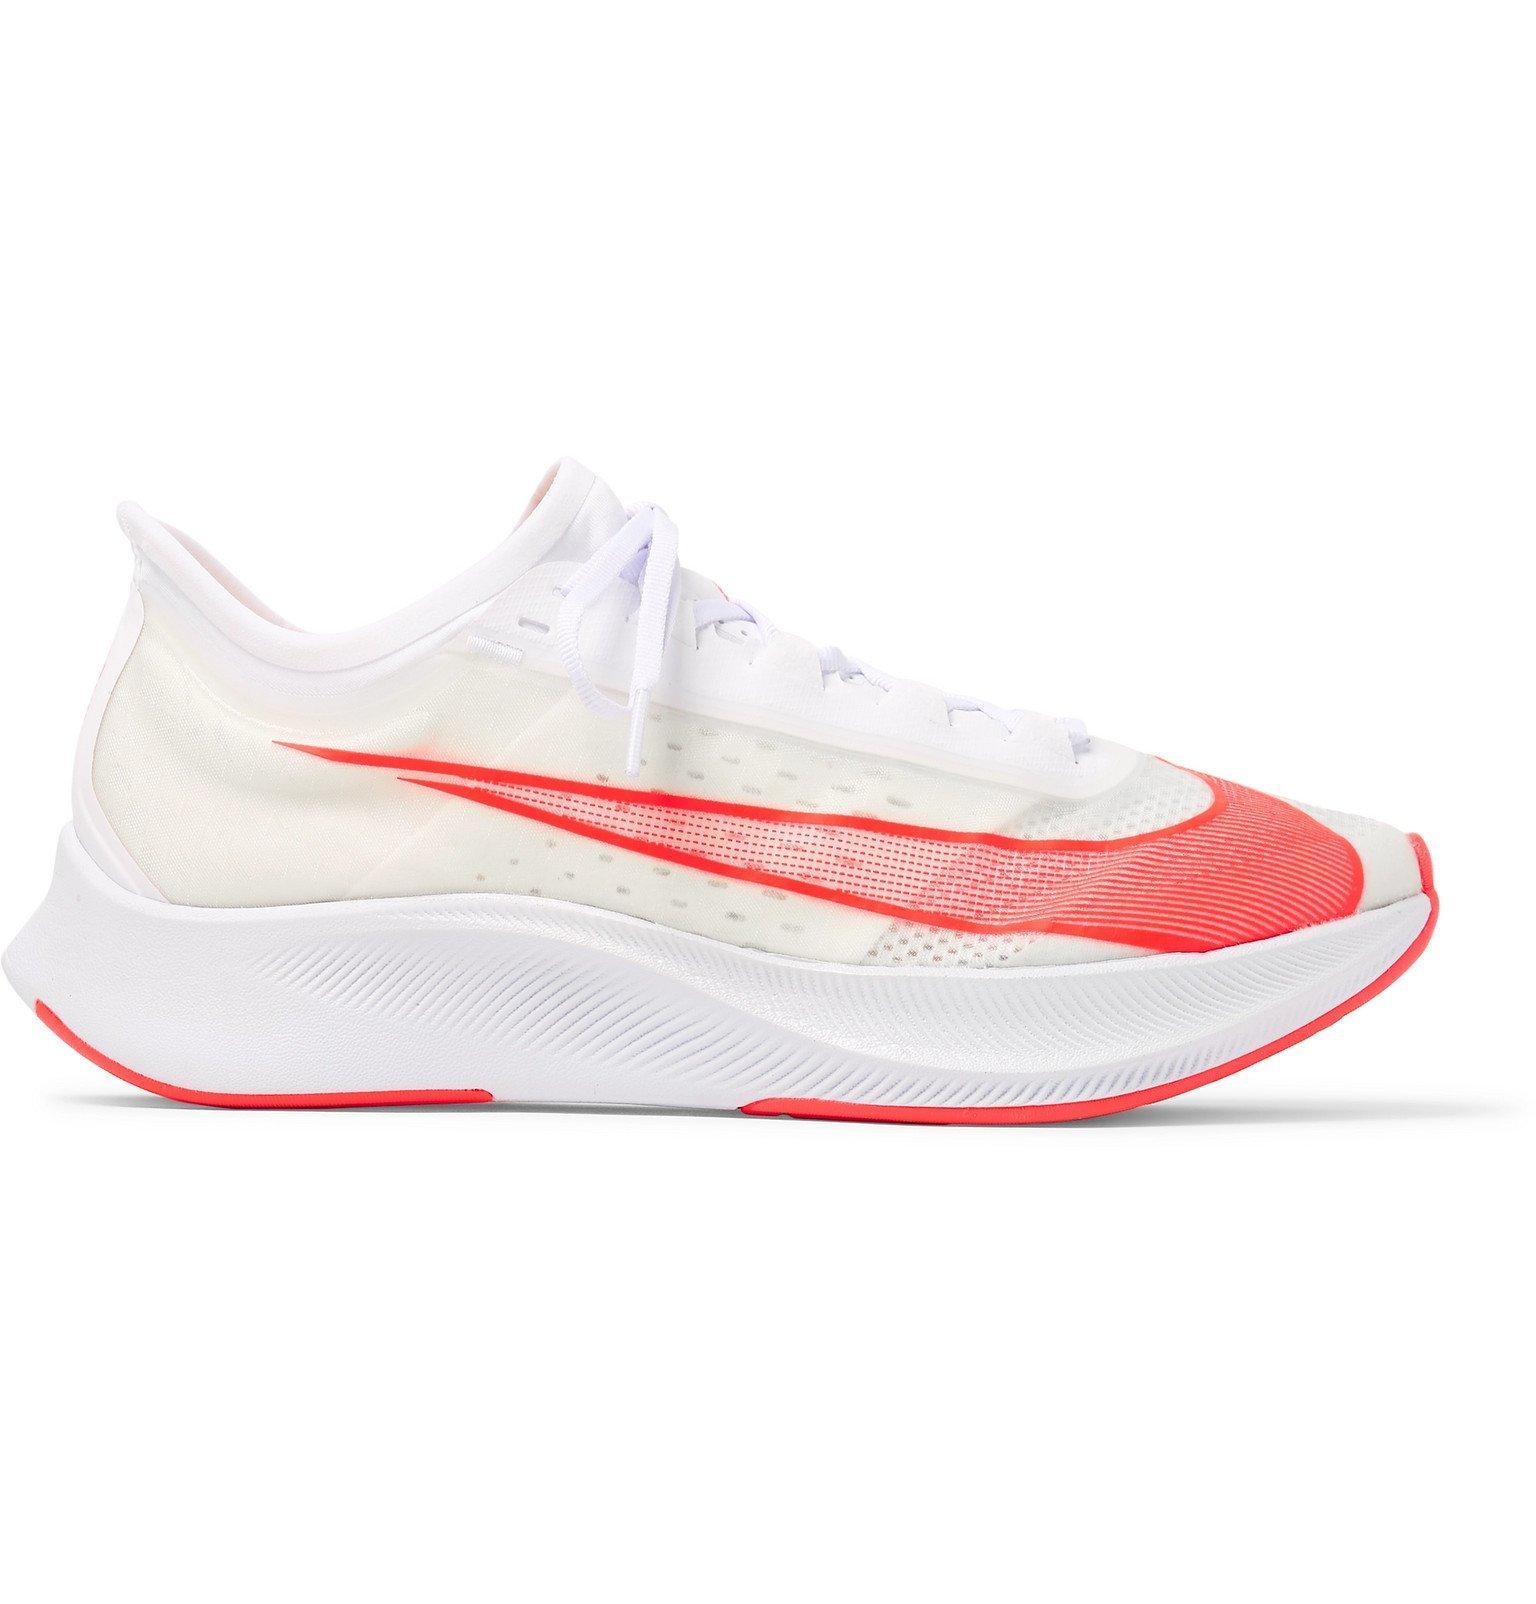 Photo: Nike Running - Zoom Fly 3 Vaporweave Running Sneakers - White